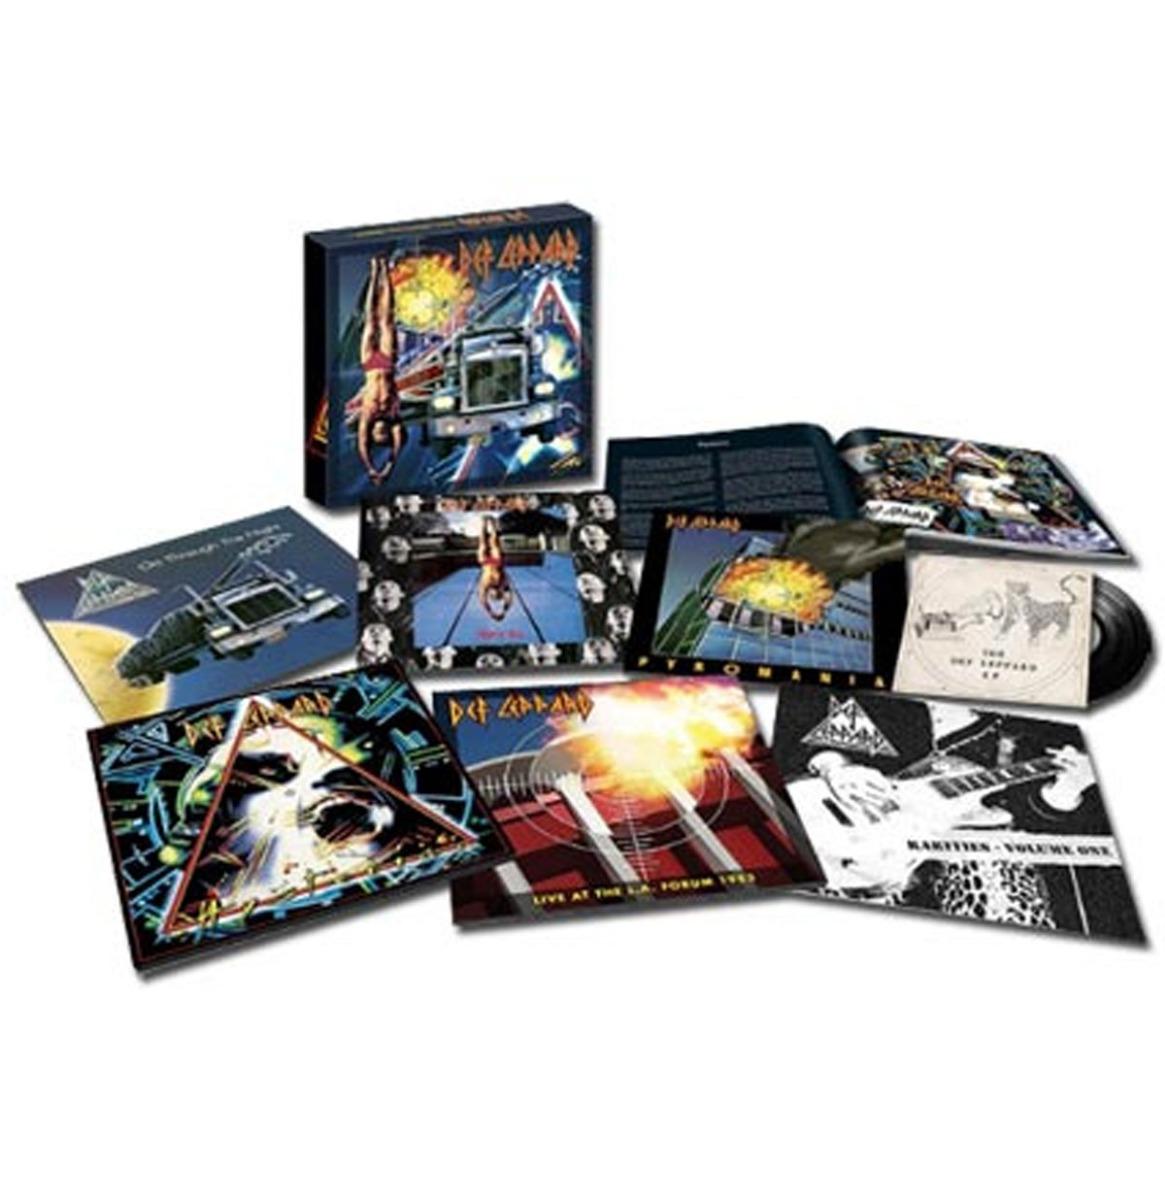 Def Leppard - 6-LP Vinyl Box Set Volume 1